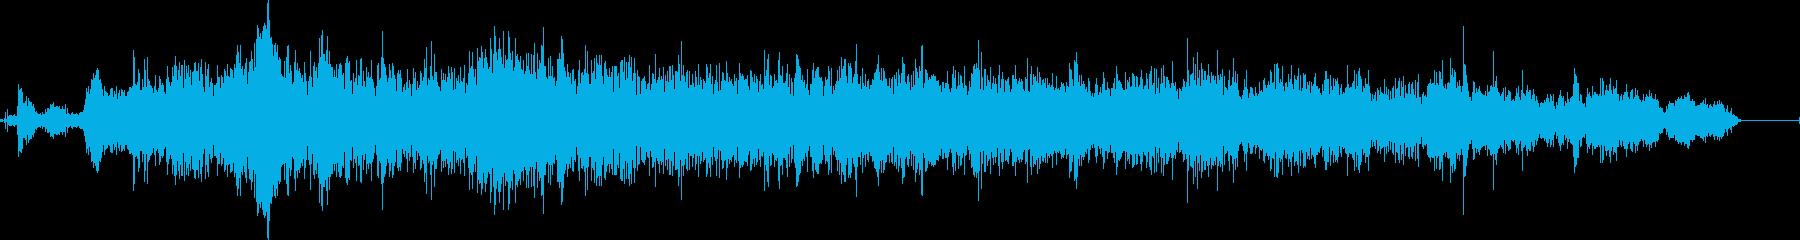 CAR、VAN V8、RIDE、M...の再生済みの波形